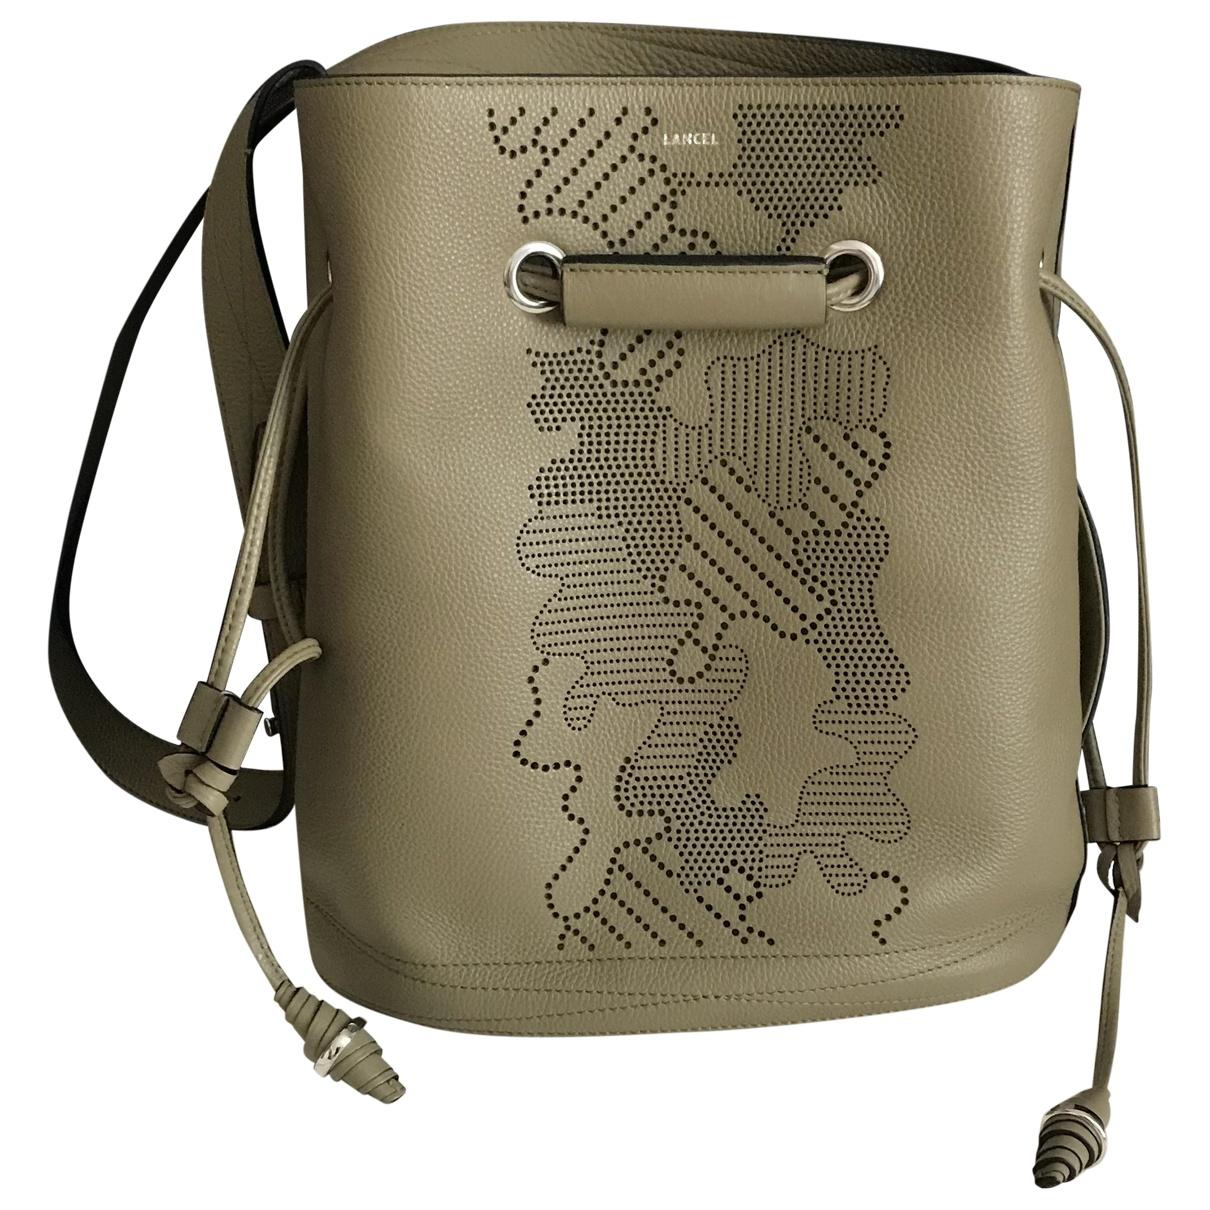 a260641680 Lyst - Lancel Leather Crossbody Bag in Green